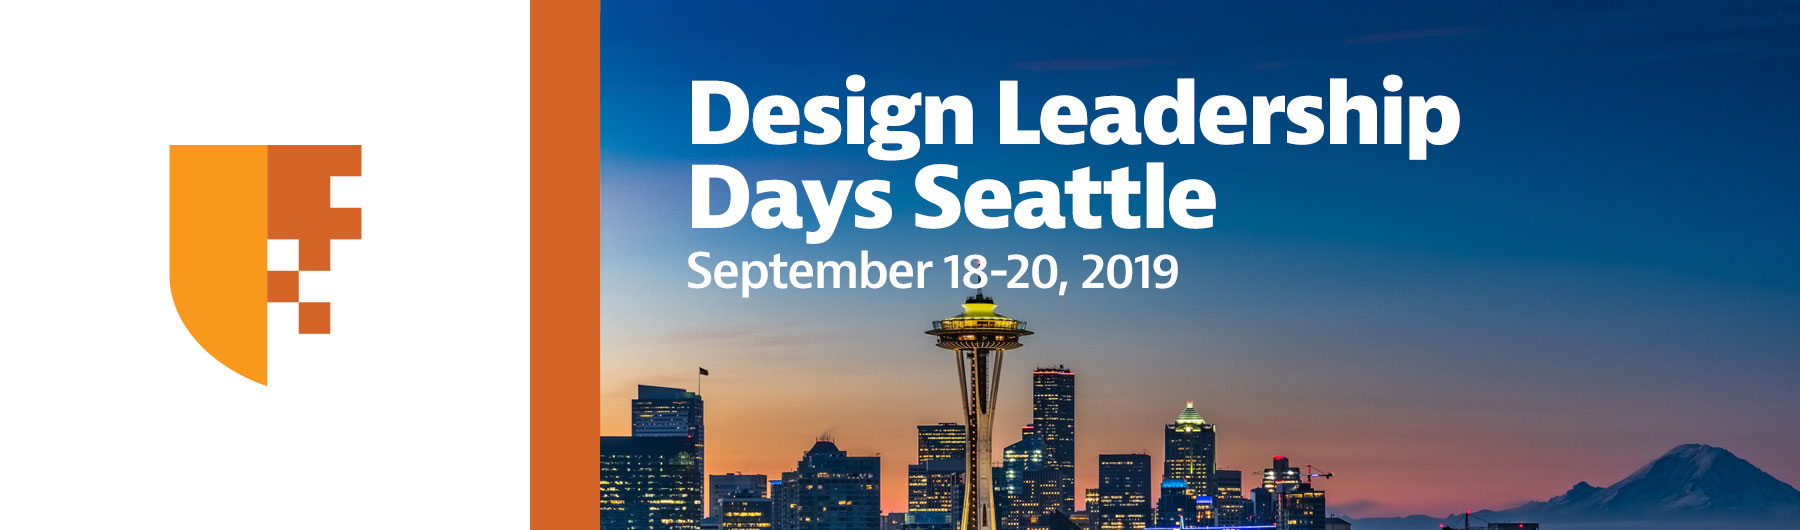 Design Leadership Days Seattle